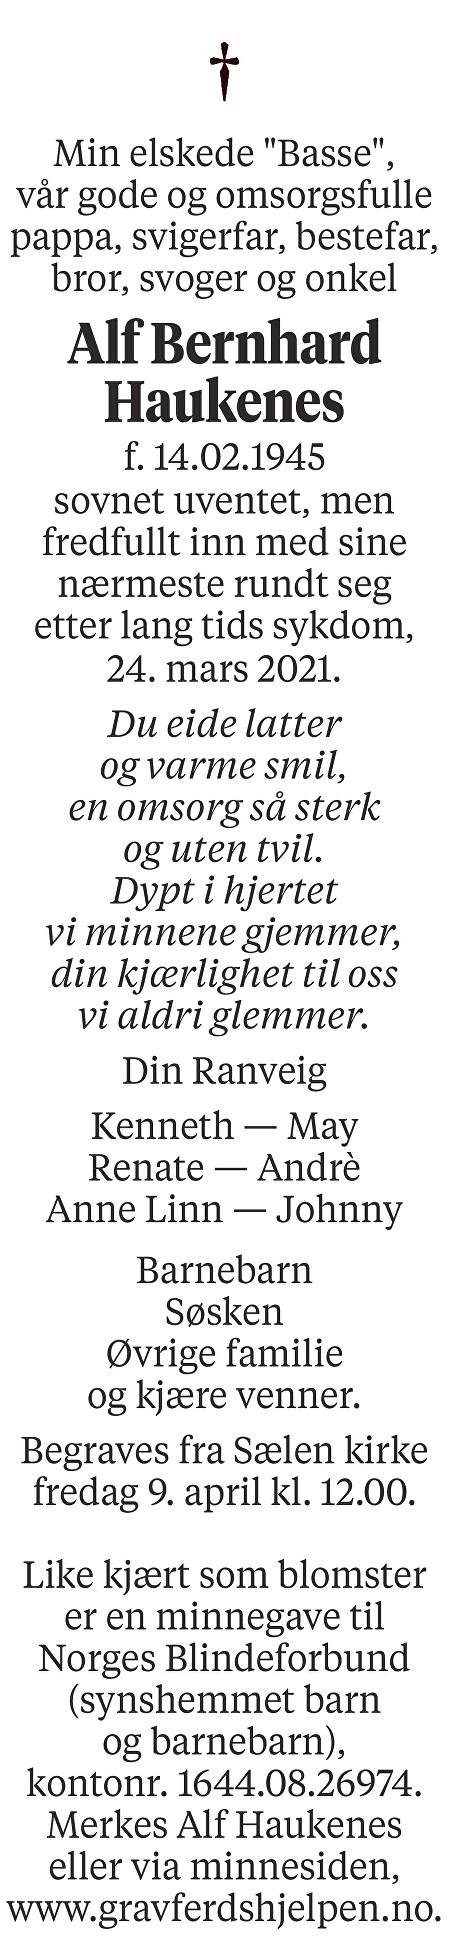 Alf Bernhard Haukenes Dødsannonse